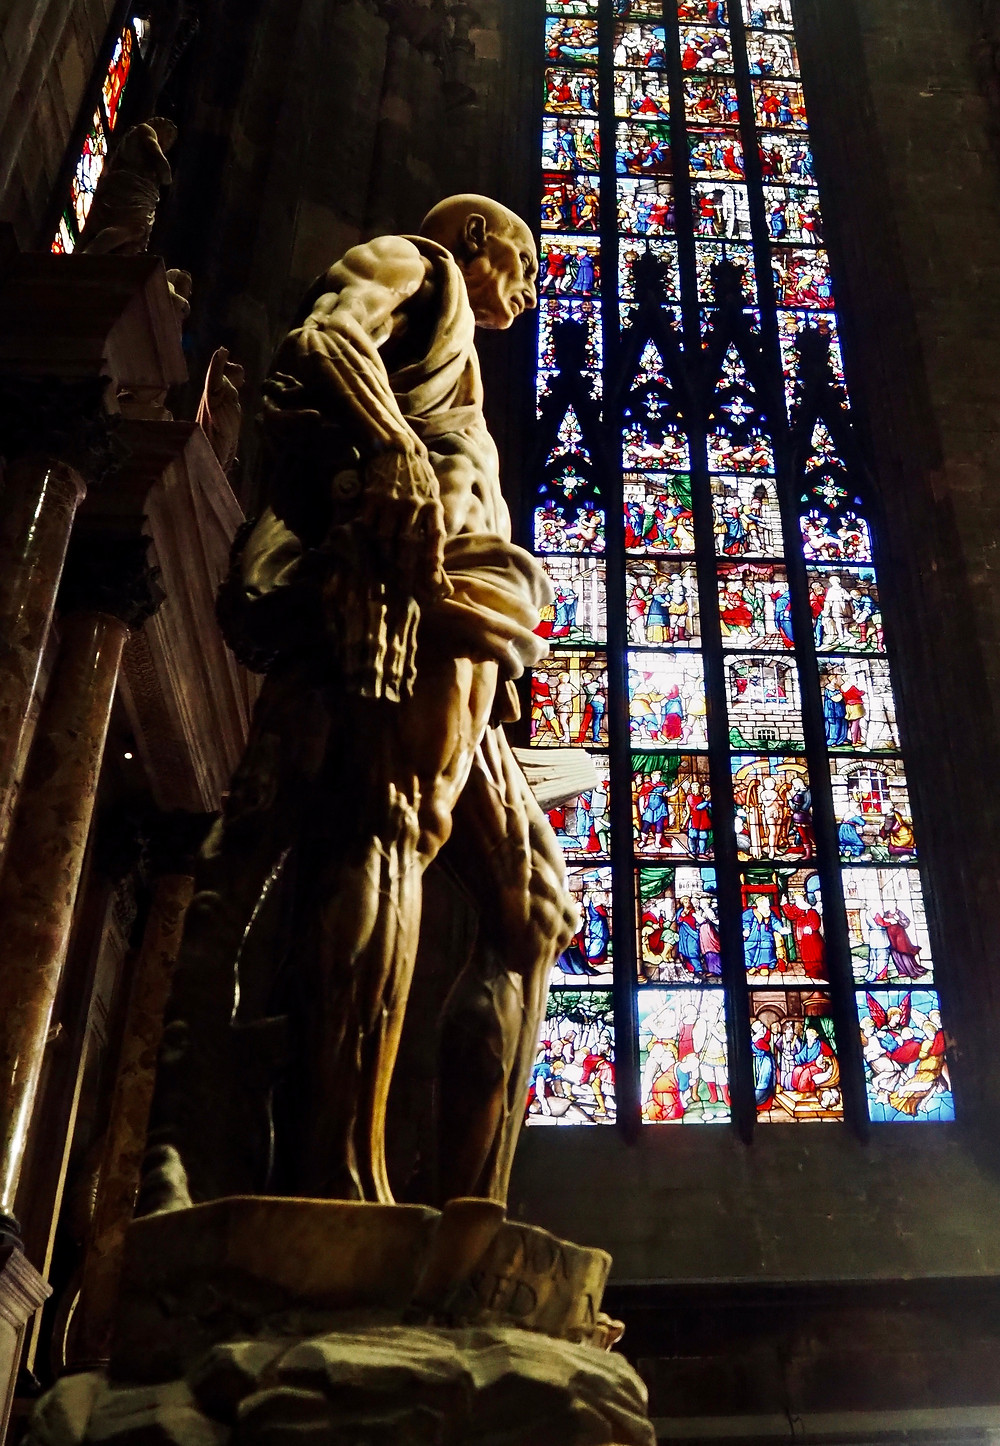 milan-cathedral-inside-art